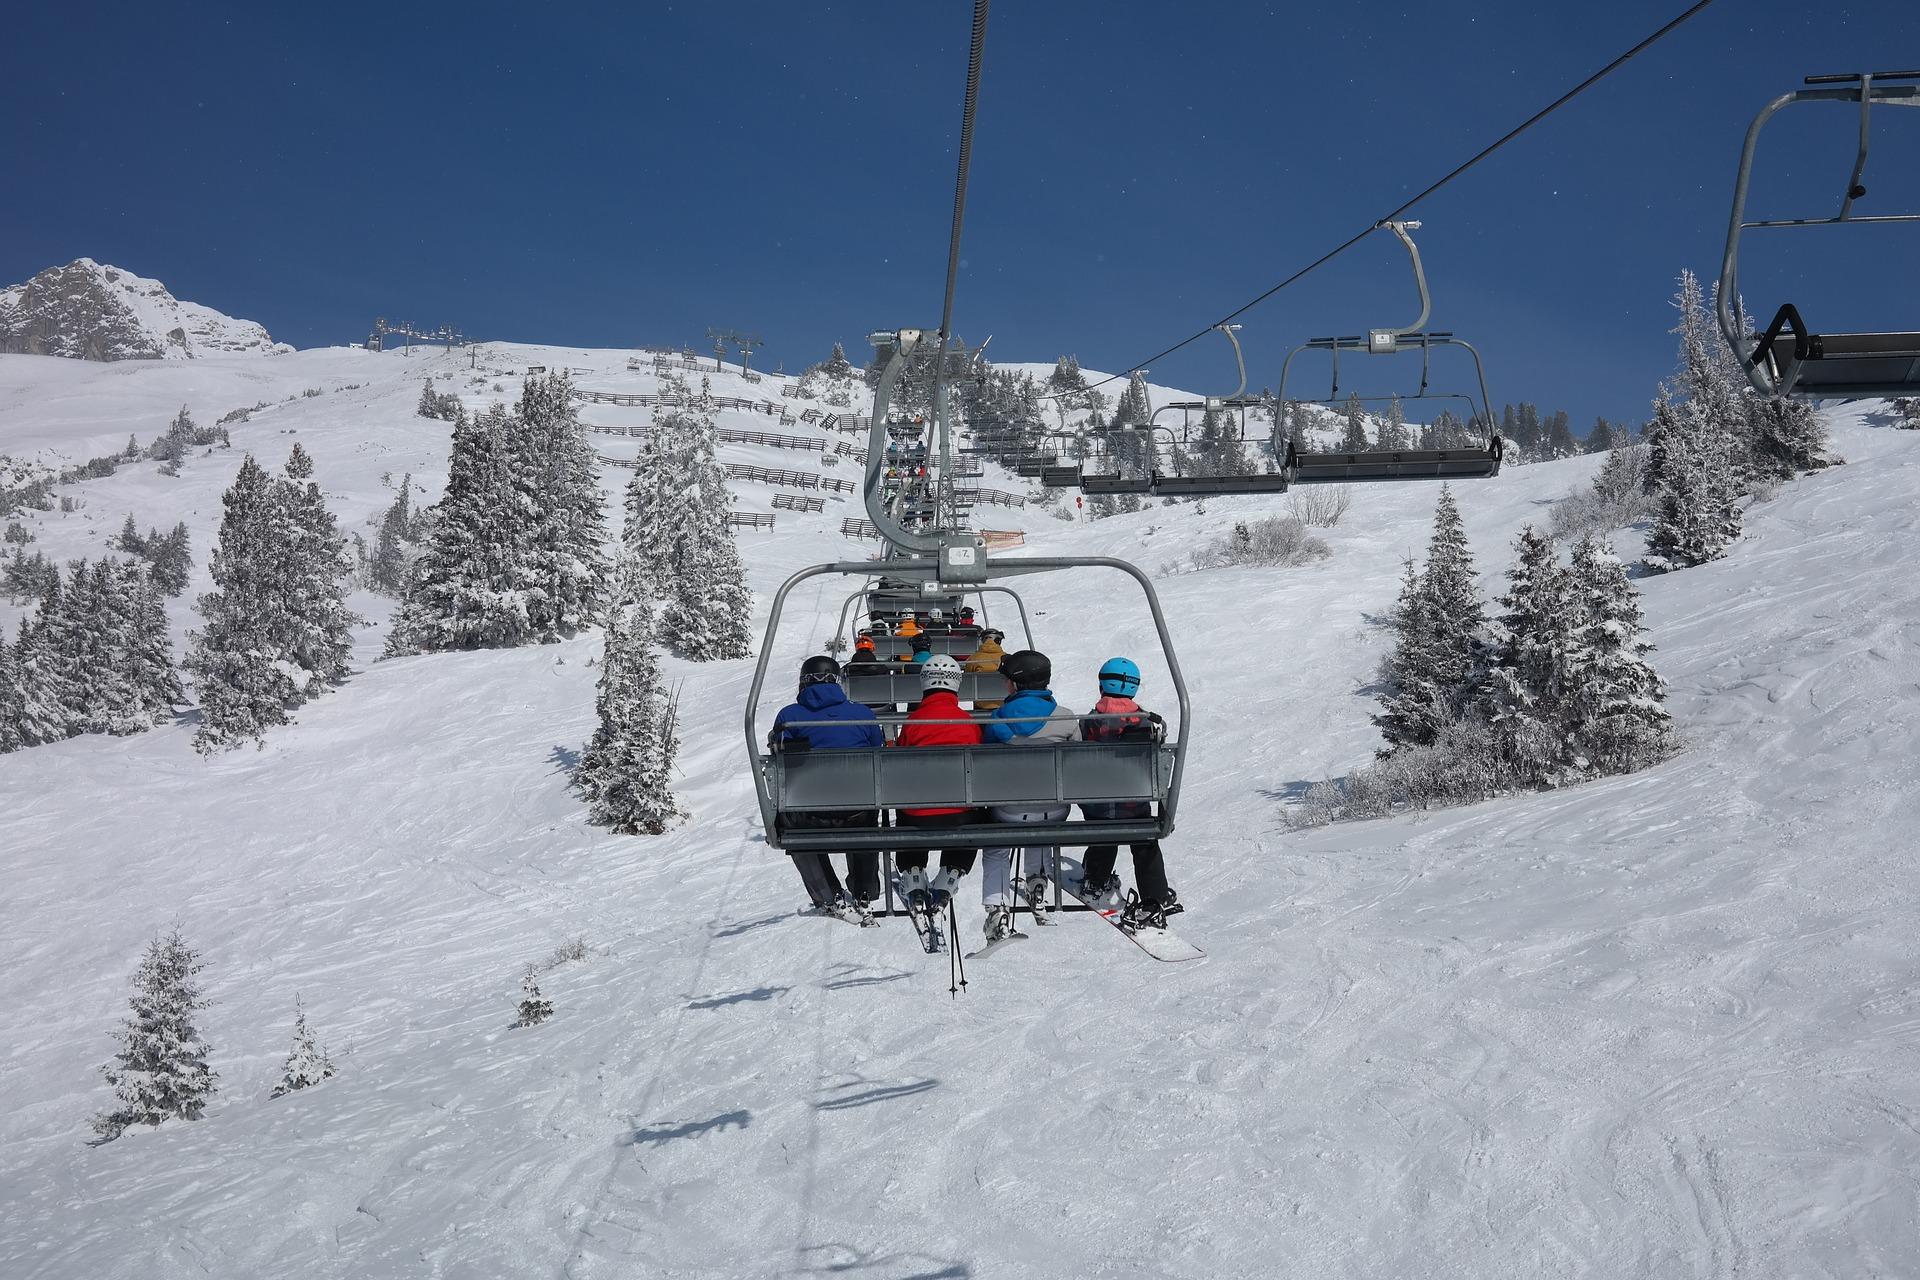 ski lift resort winter snow pixabay